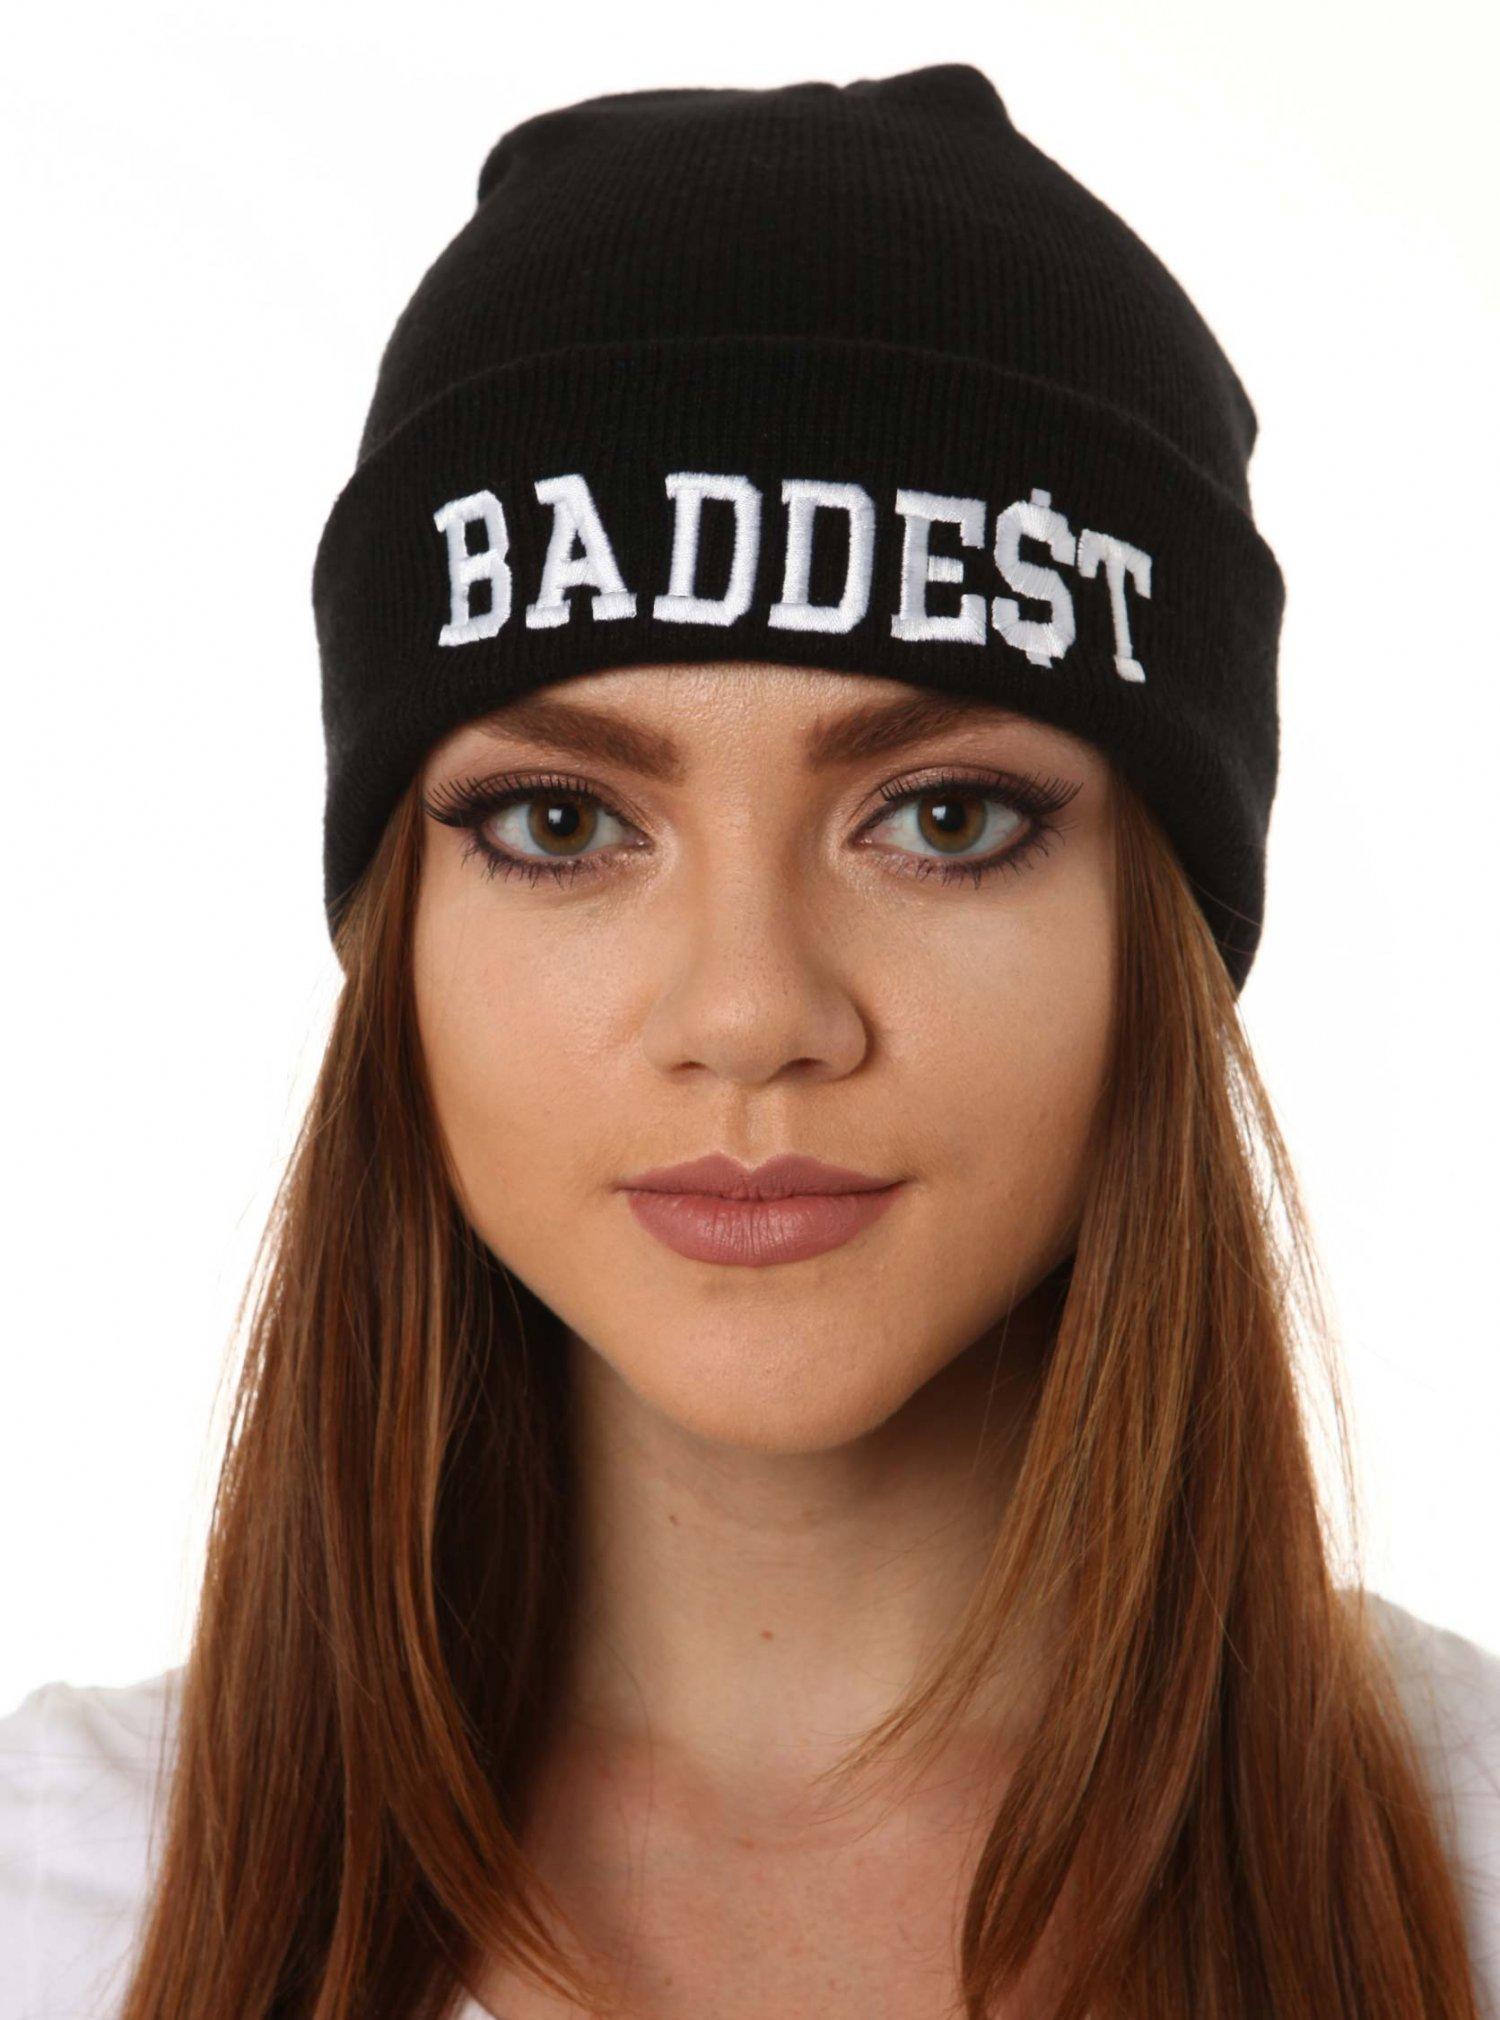 Black Beanie - Baddest Beanie | UsTrendy